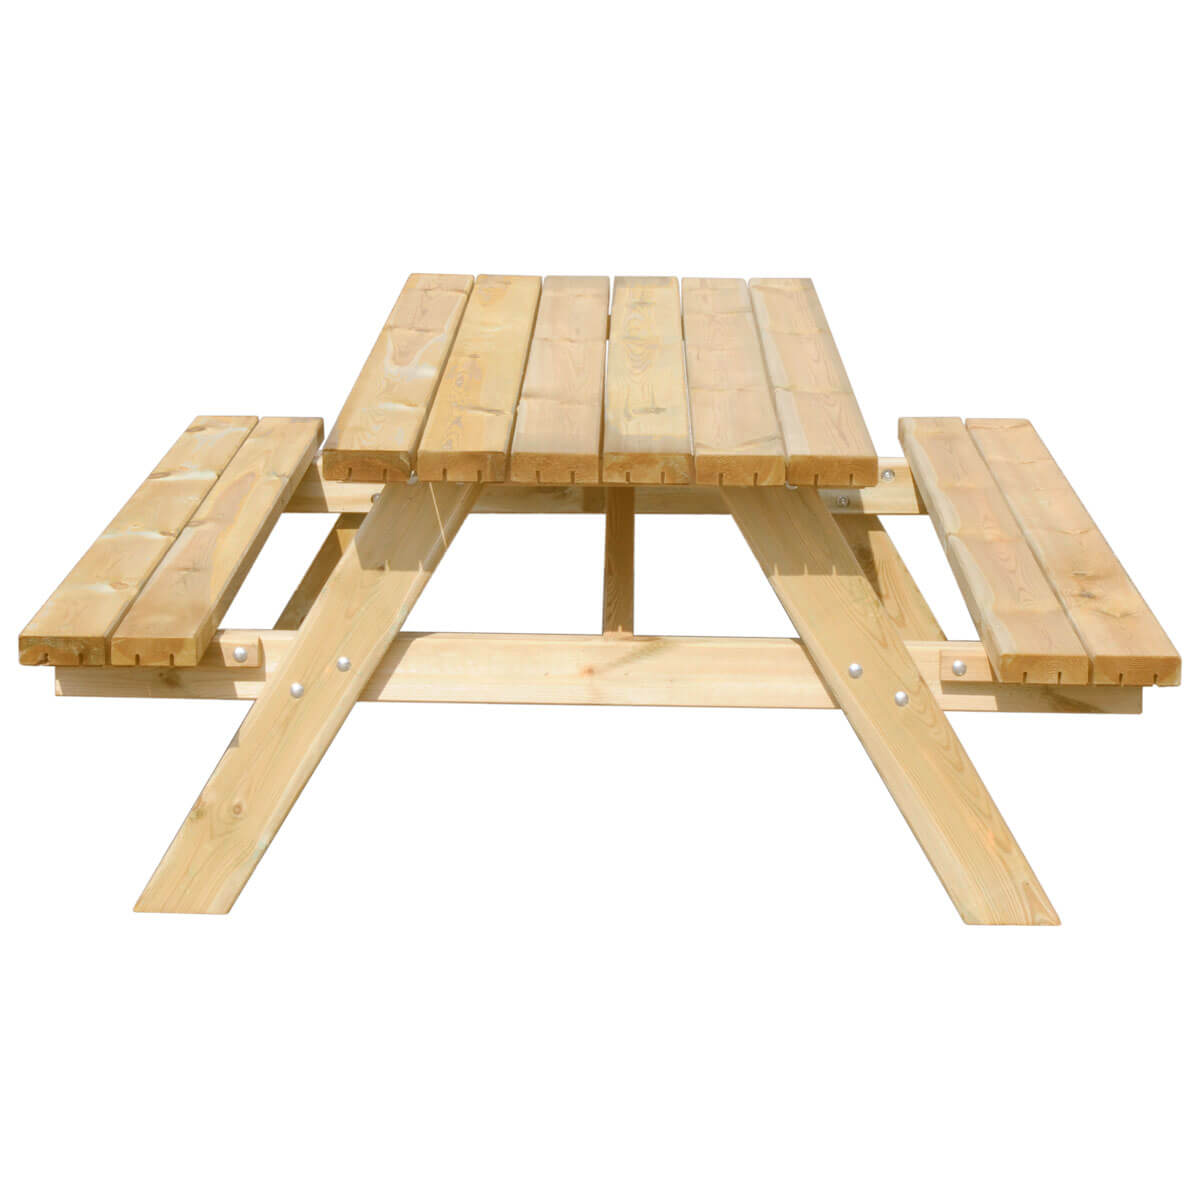 Picknicktafel Goede Kwaliteit.Picknicktafel Deluxe 180 X 70 Cm